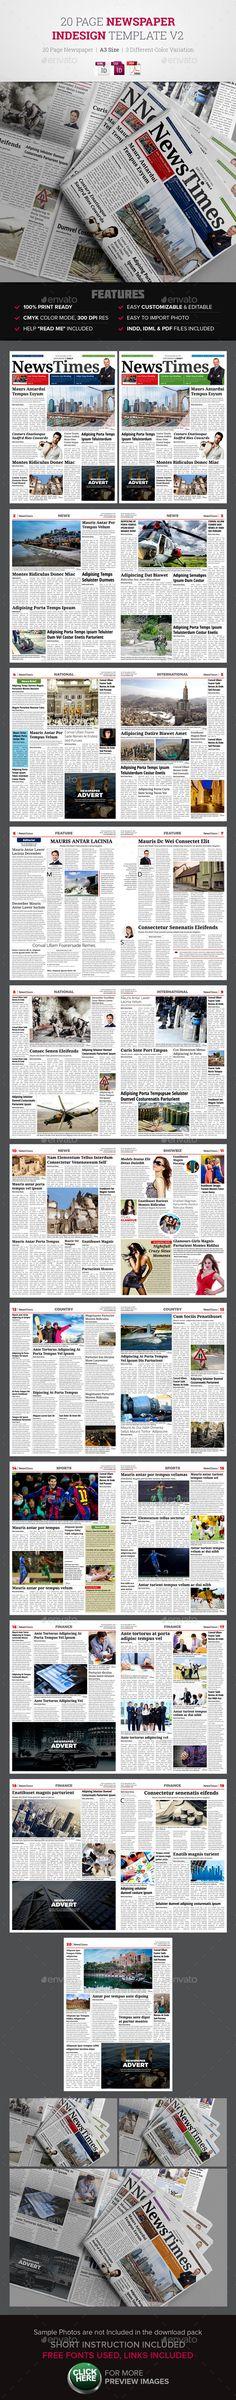 20 Page Newspaper Indesign Template #design Download: http://graphicriver.net/item/20-page-newspaper-indesign-template-v2/12190564?ref=ksioks